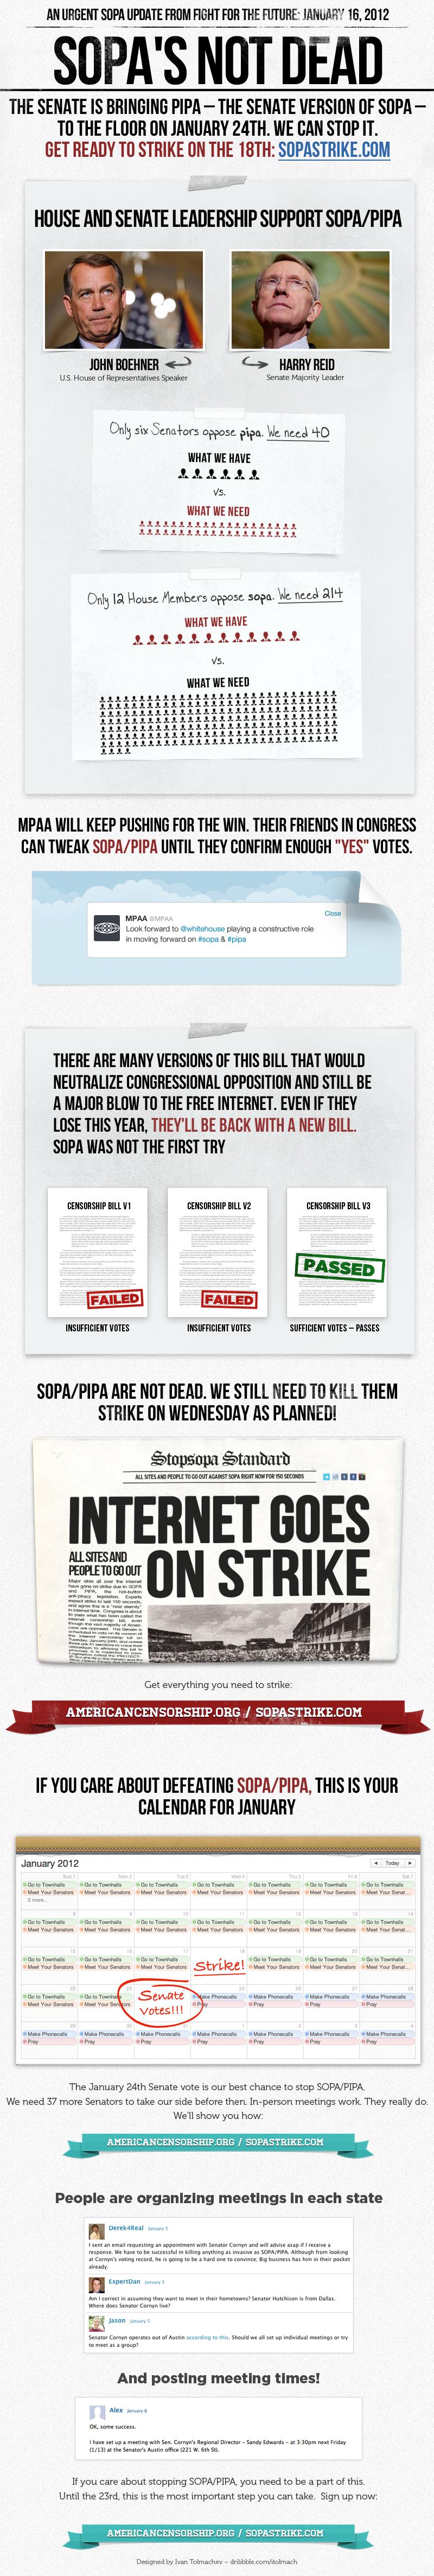 Strike infographic